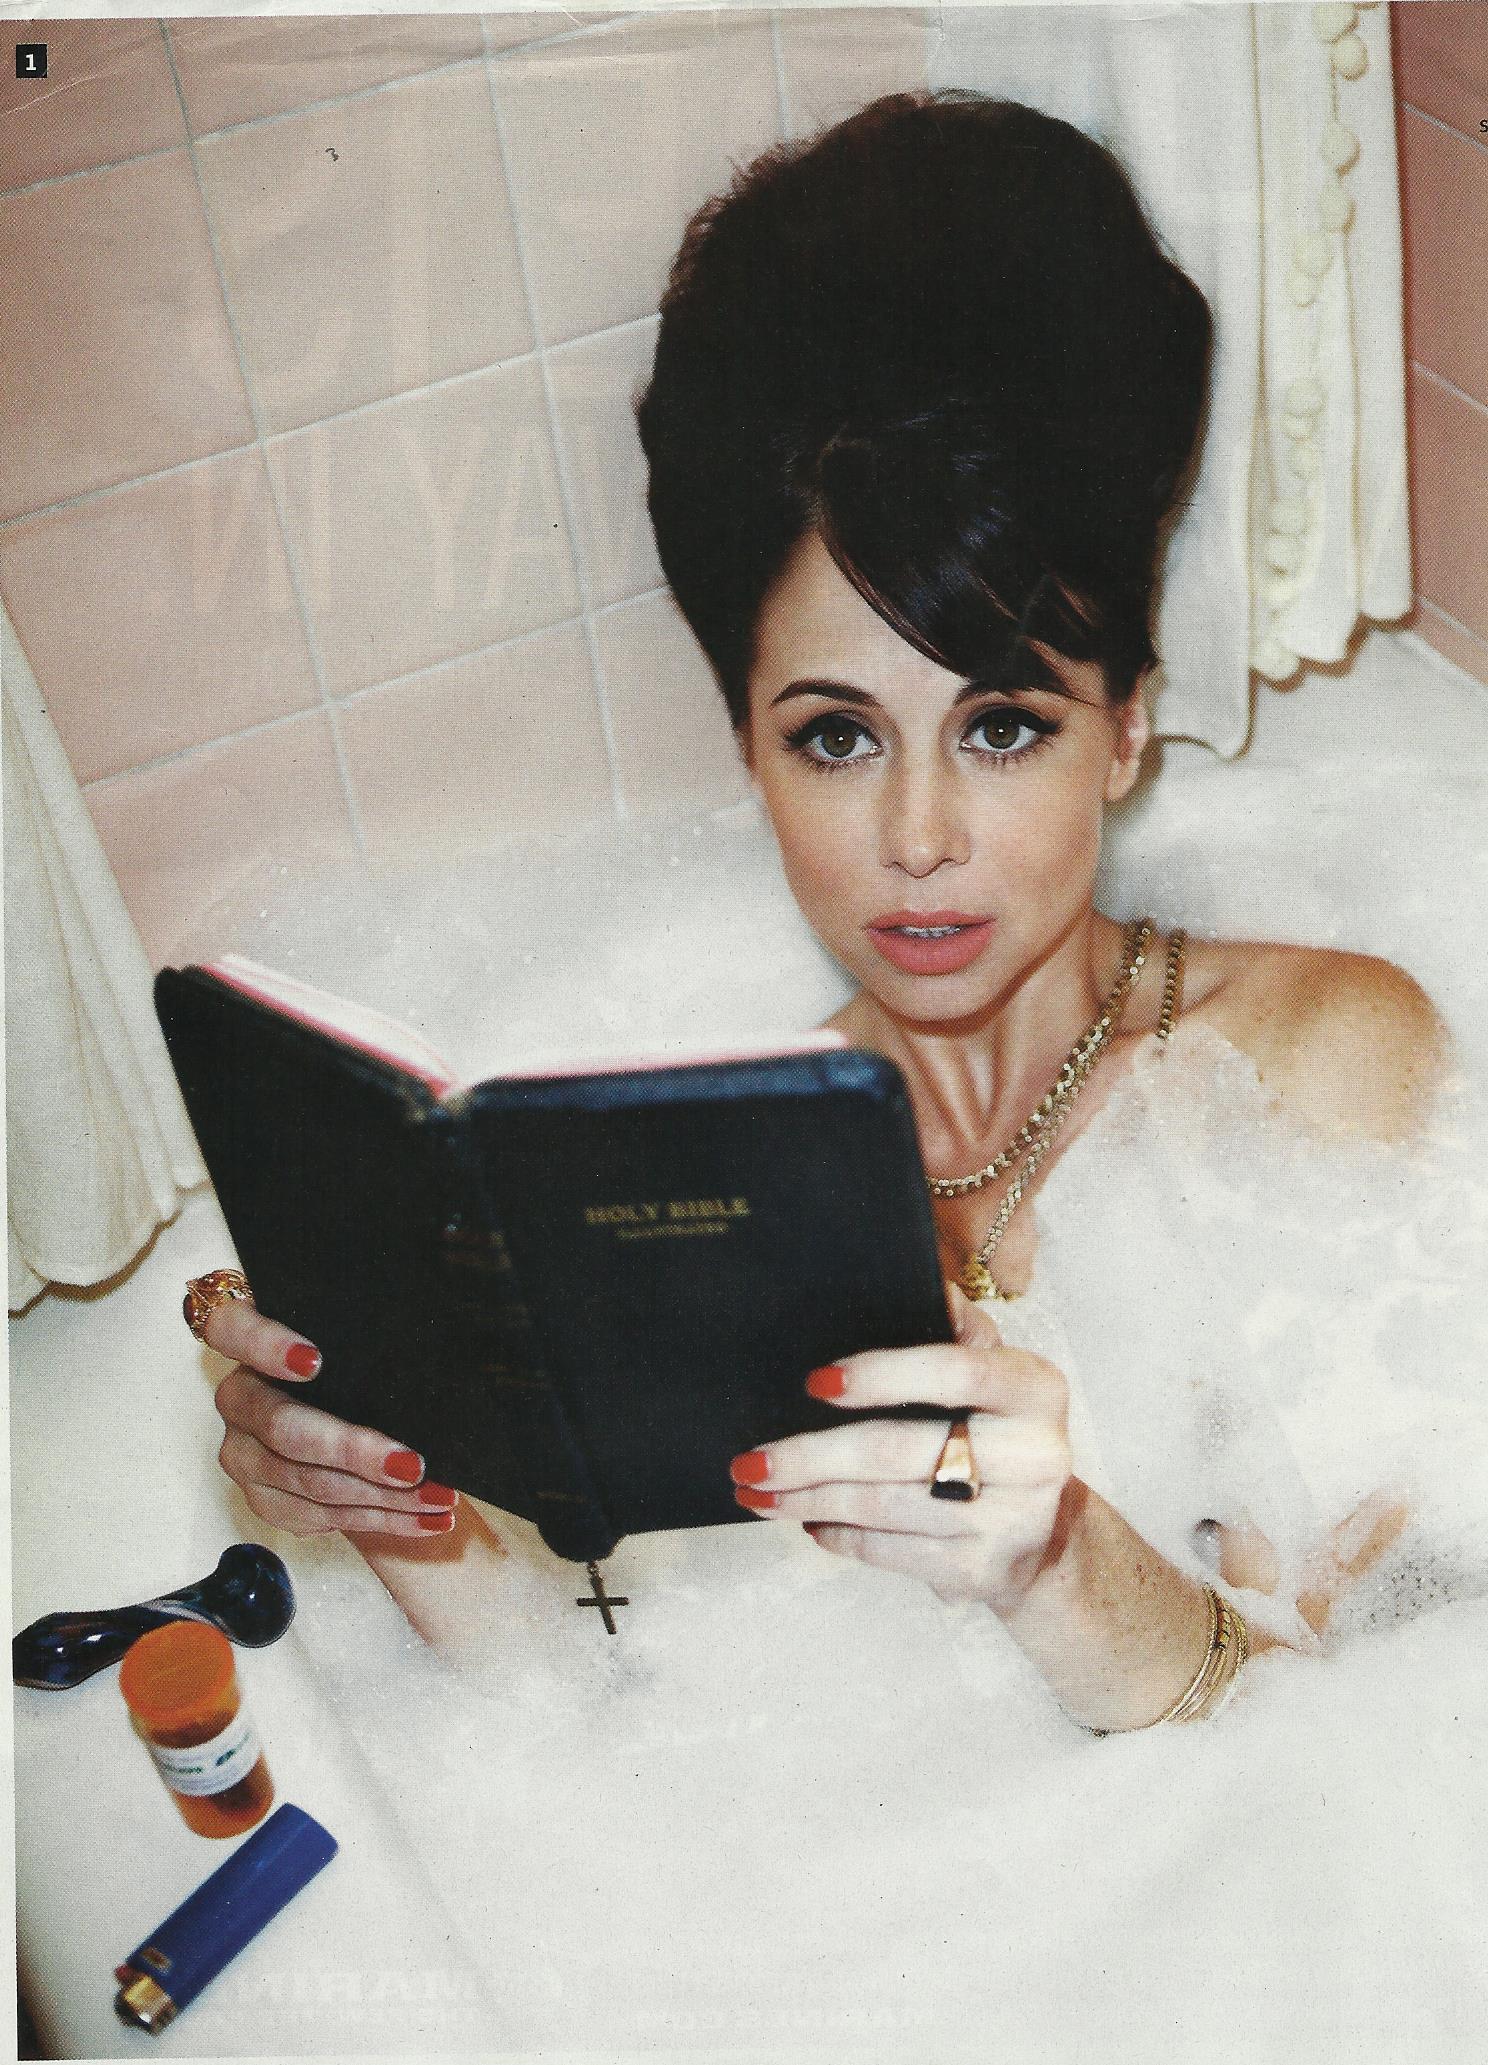 Natasha leggero naked